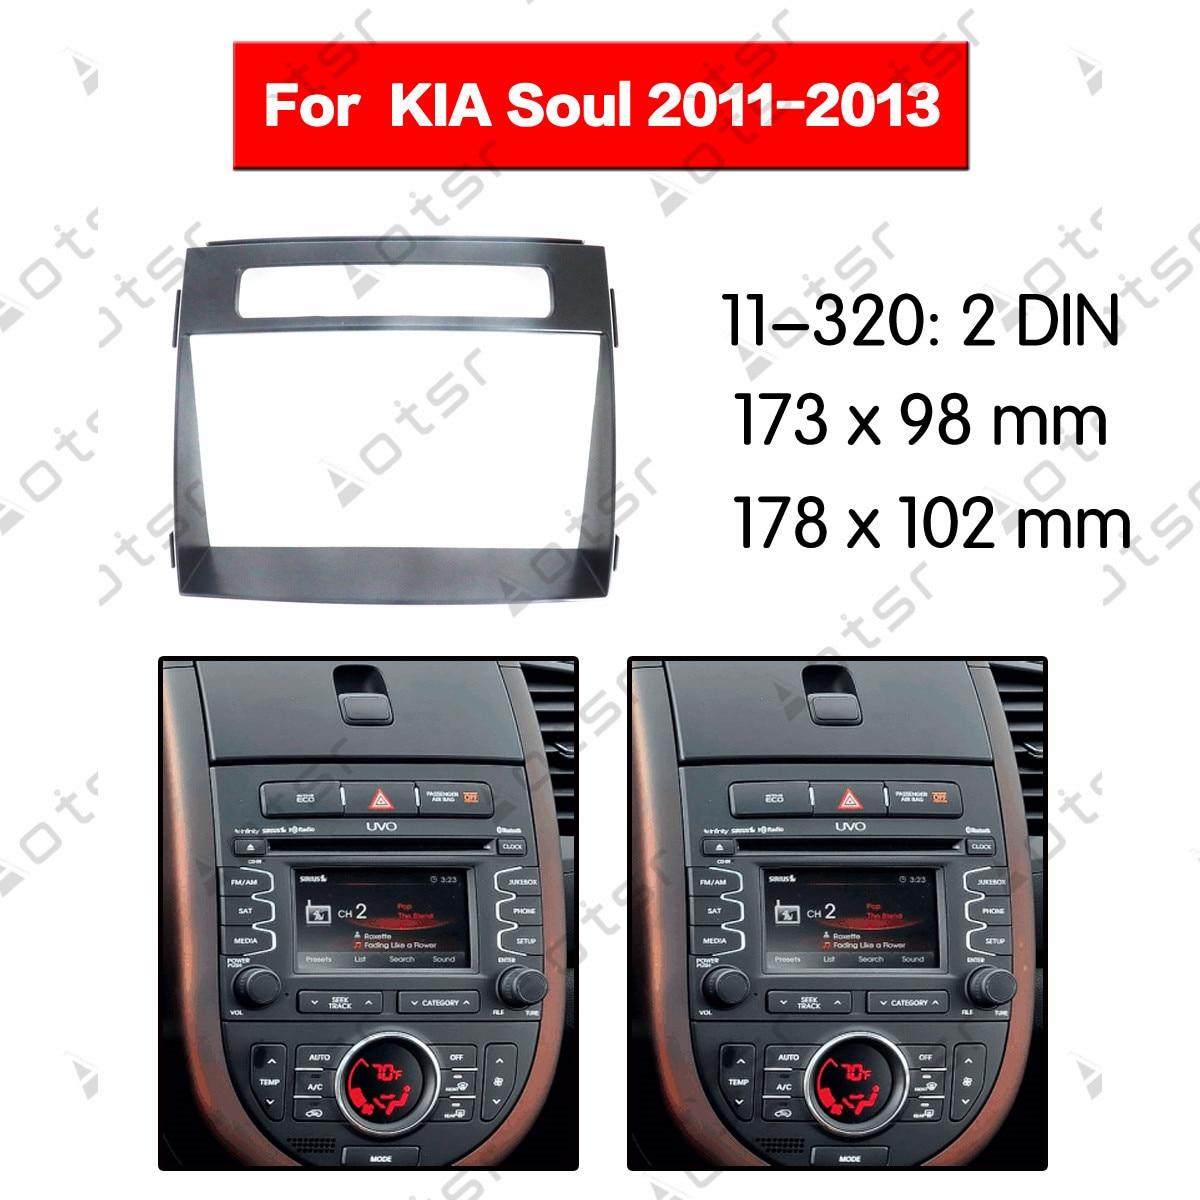 Placa de Panel estéreo envolvente Radio coche Fascia para KIA alma 2011 2012 2013 Kit de tablero DVD Marco de reposición